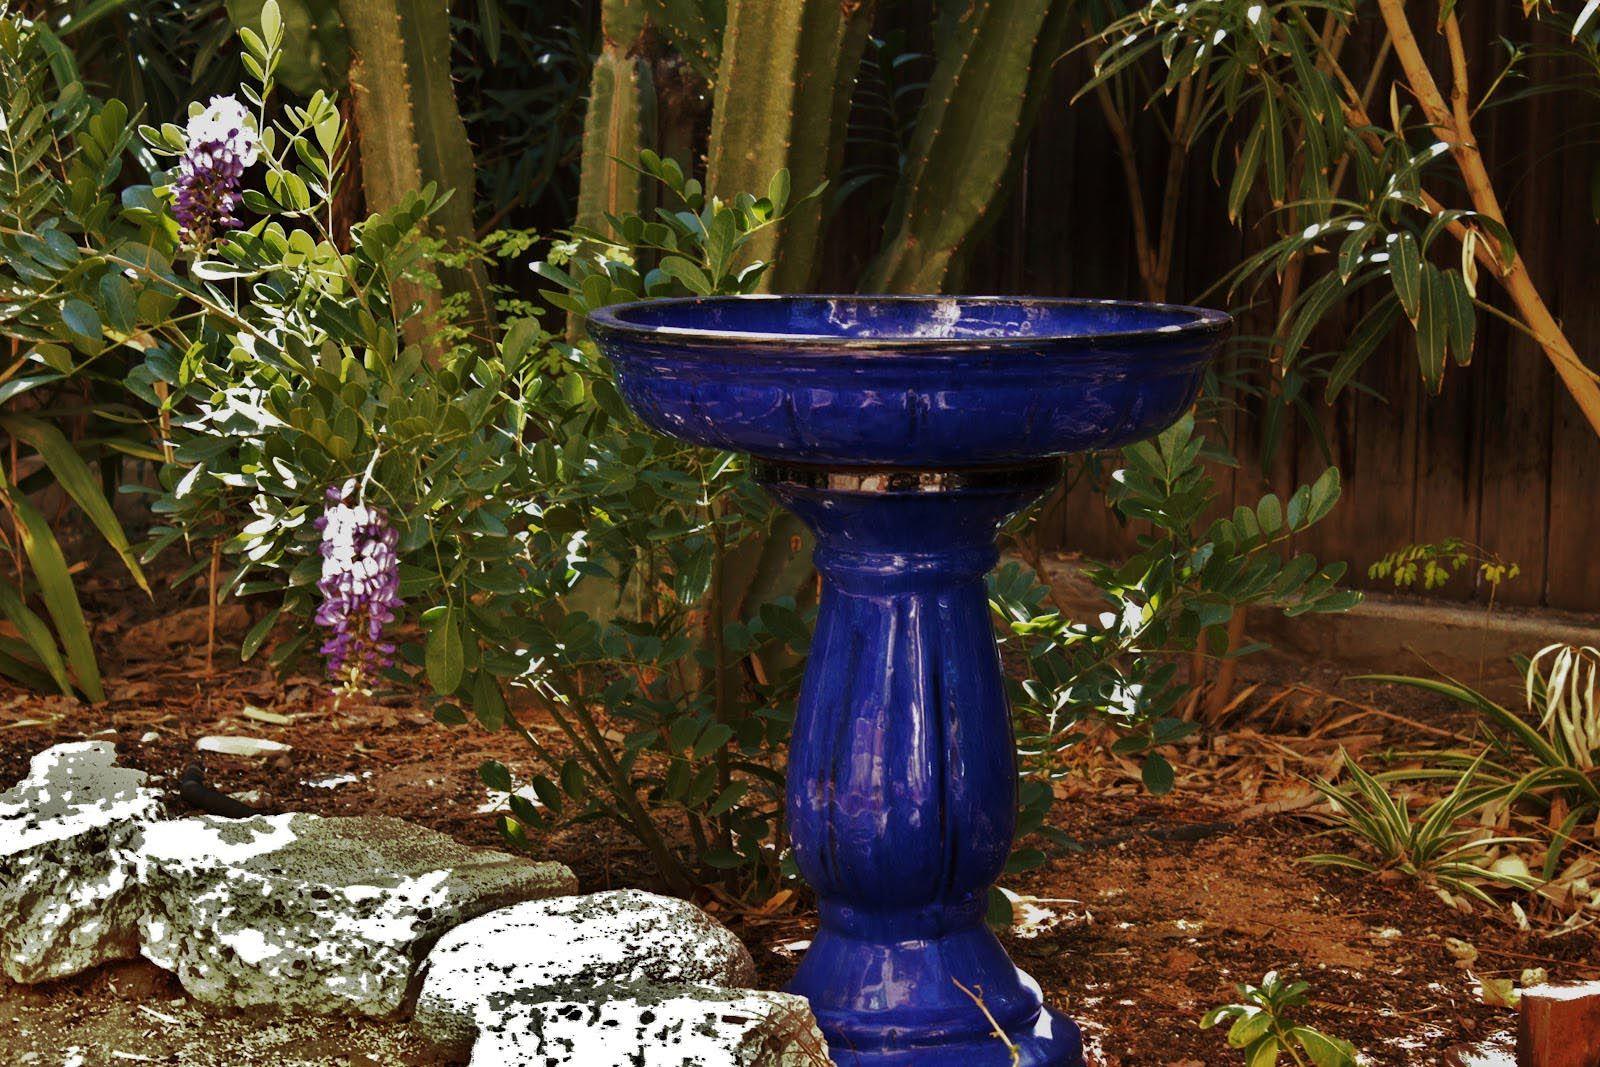 Cobalt Blue Ceramic Bird Bath Bird Bath Ceramic Bird Bath Diy Bird Bath